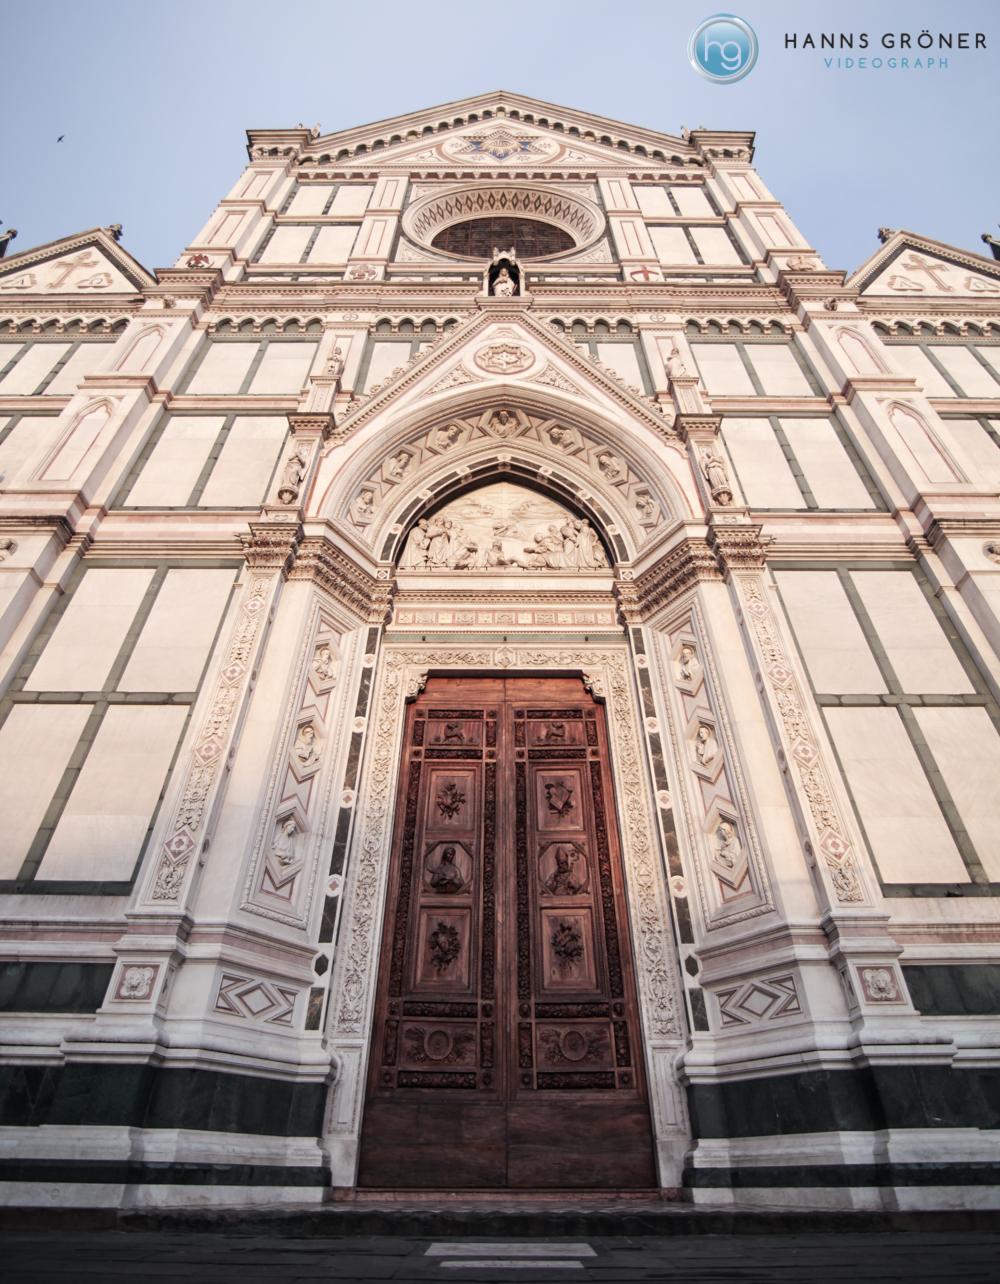 Italien |Florenz - Santa Croce